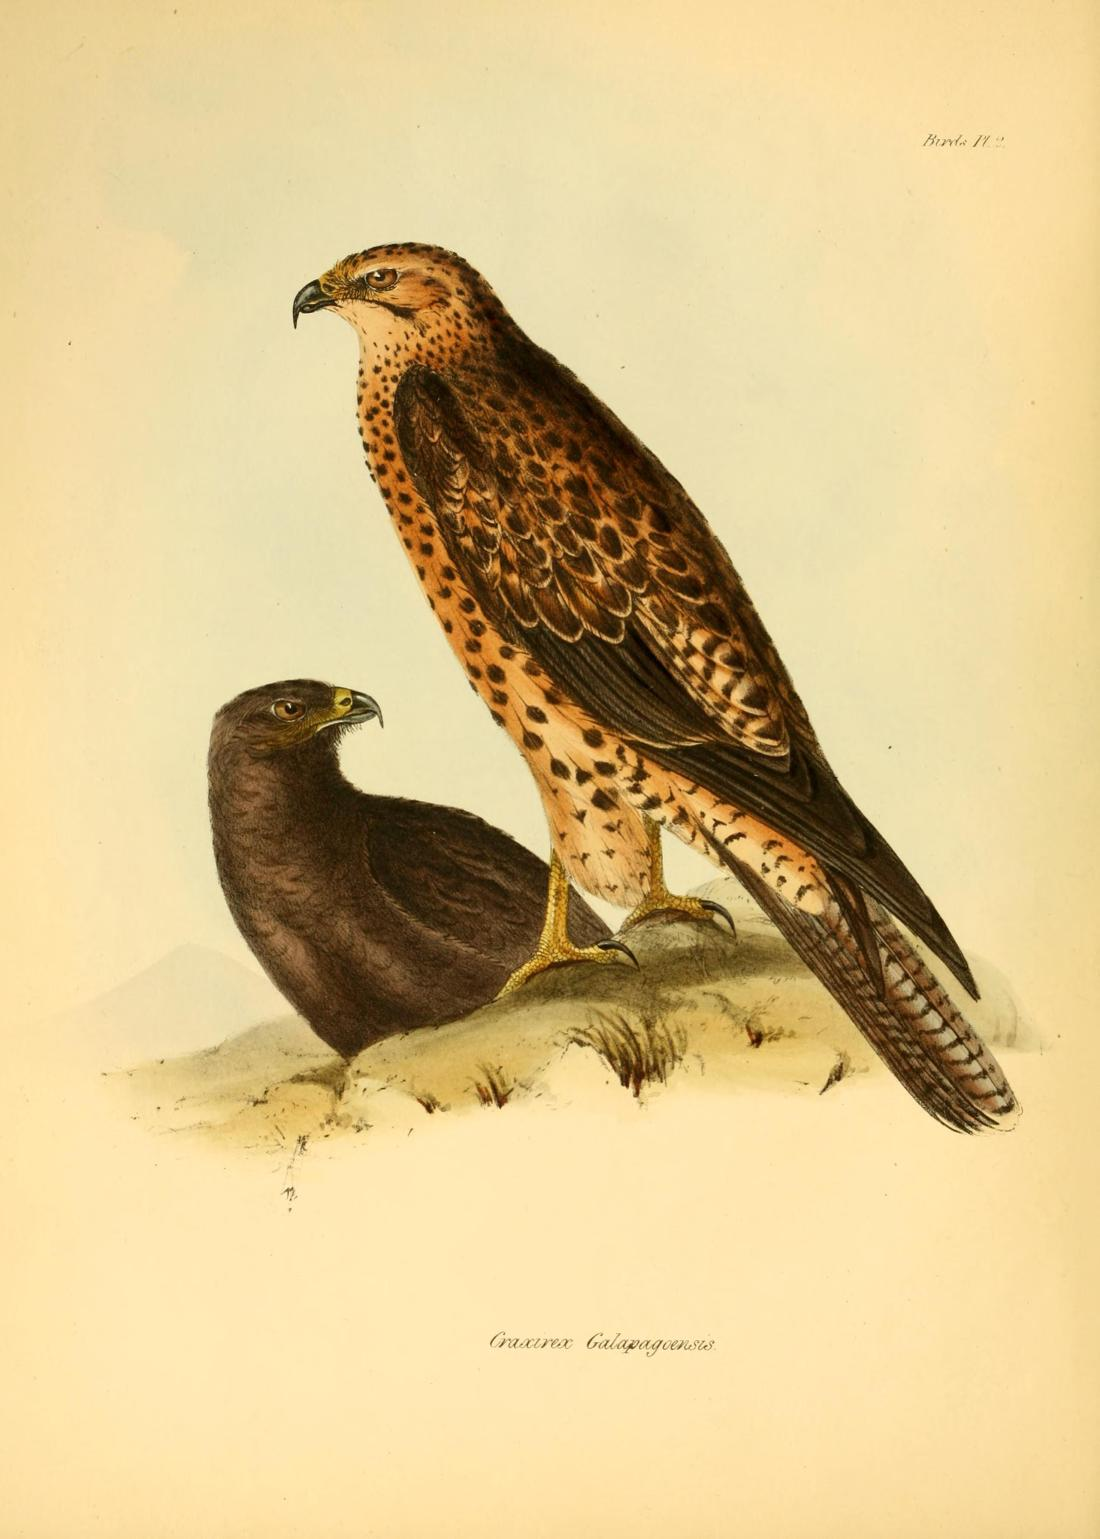 """Craxirex galapagoensis"" (Galapagos Hawk)."